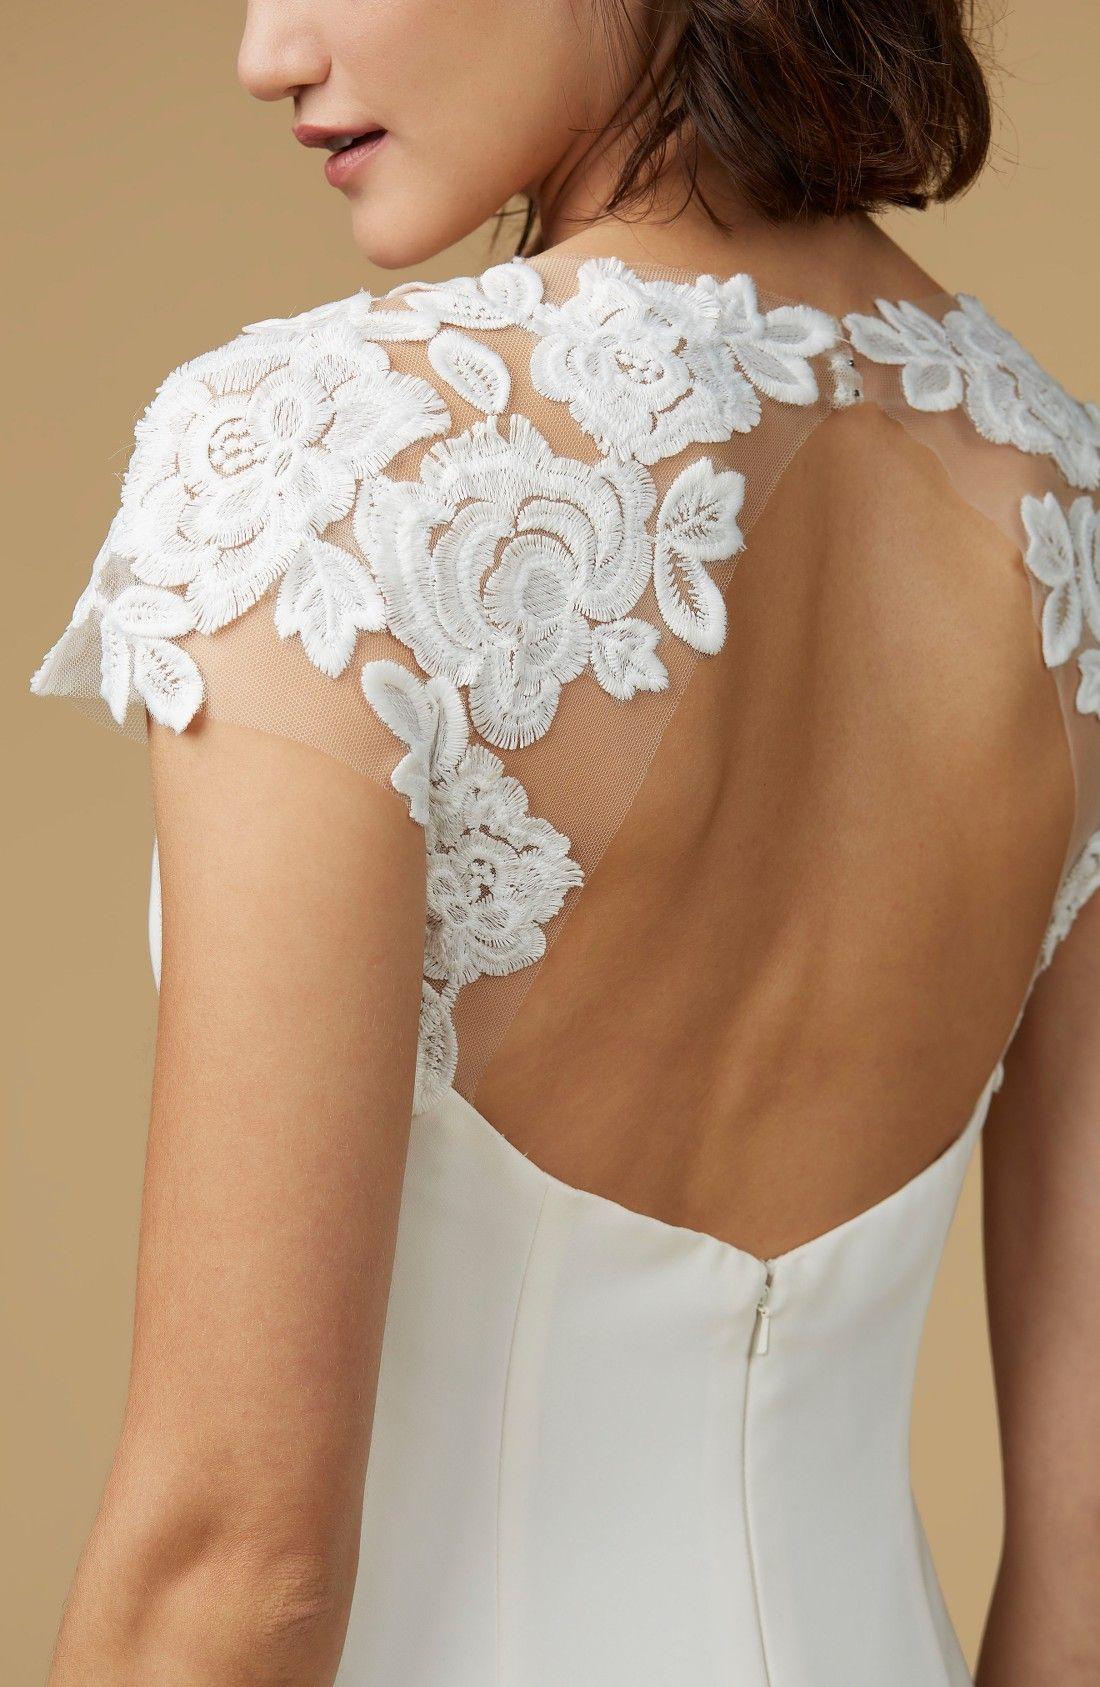 Mother of the bride wedding dresses nordstrom  Amanda Mermaid Gown  Mermaid gown Amanda and Mermaid